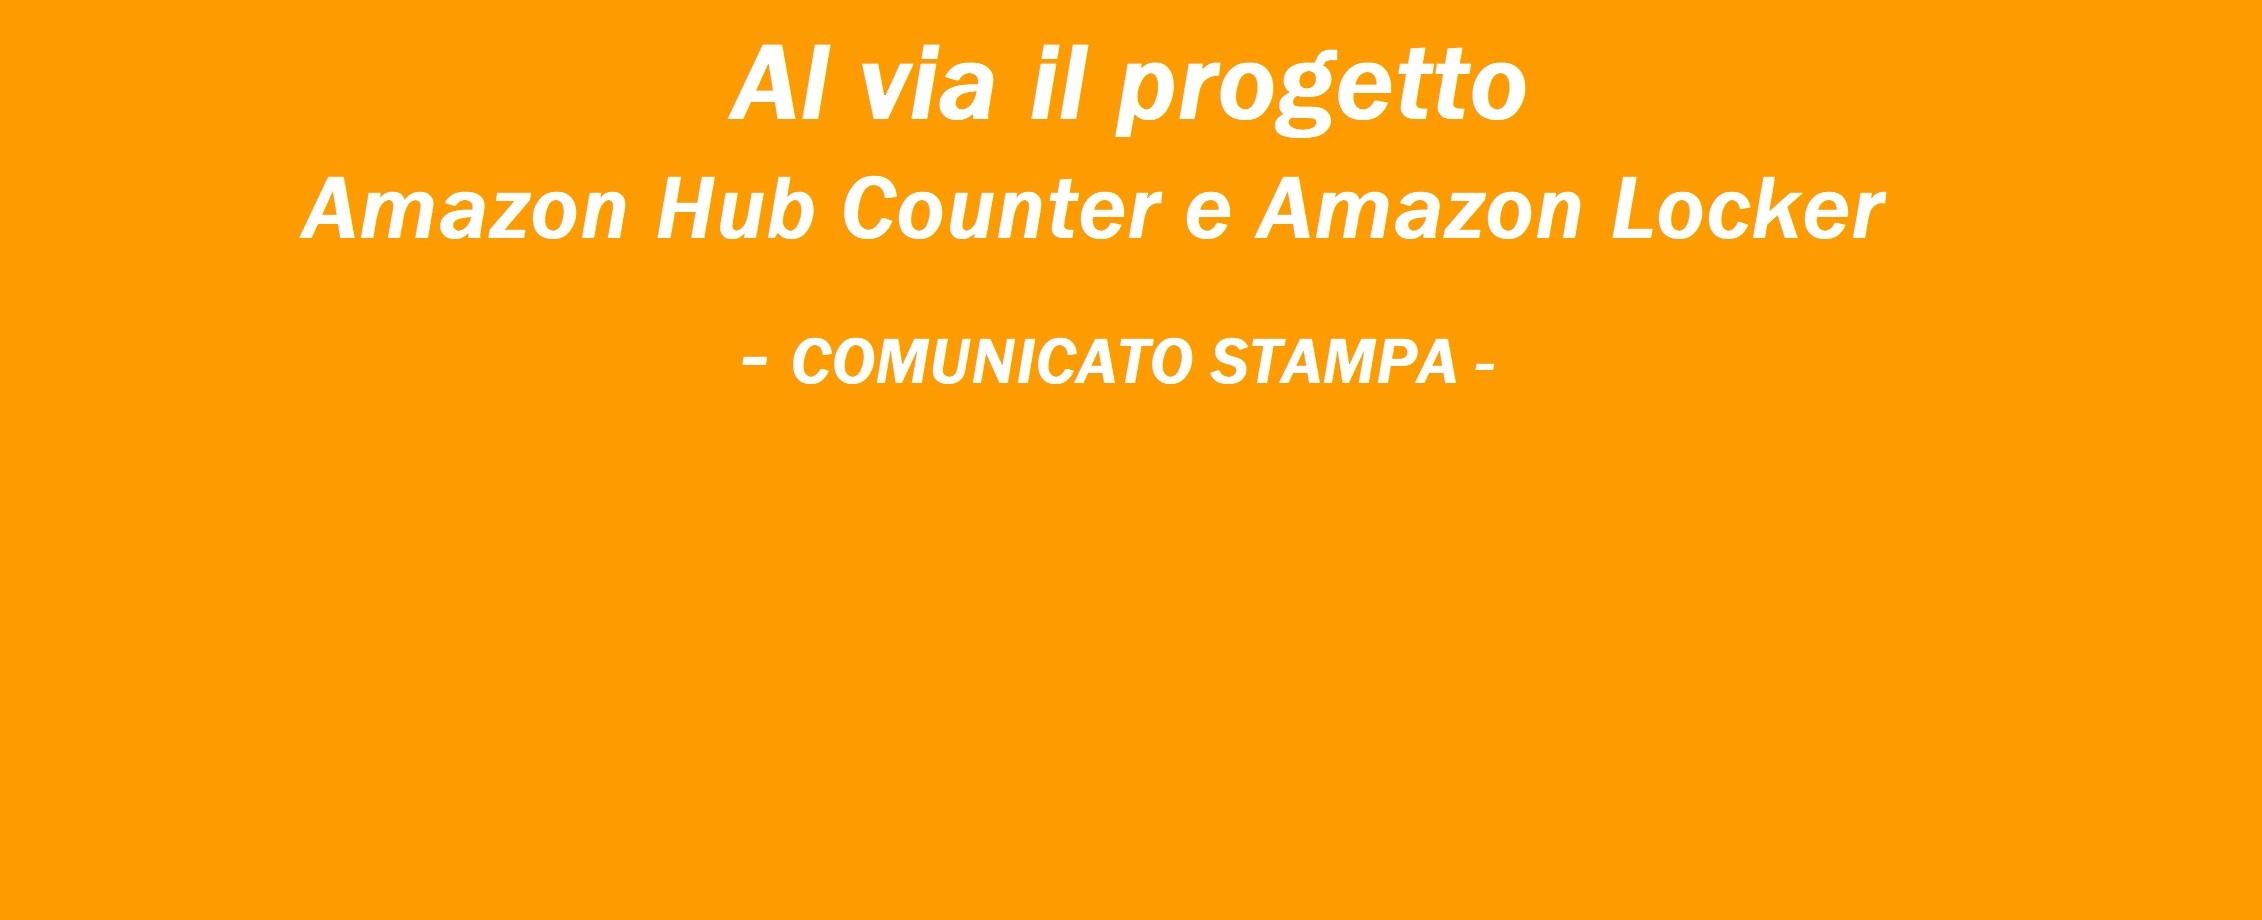 Banner-Amazon_1